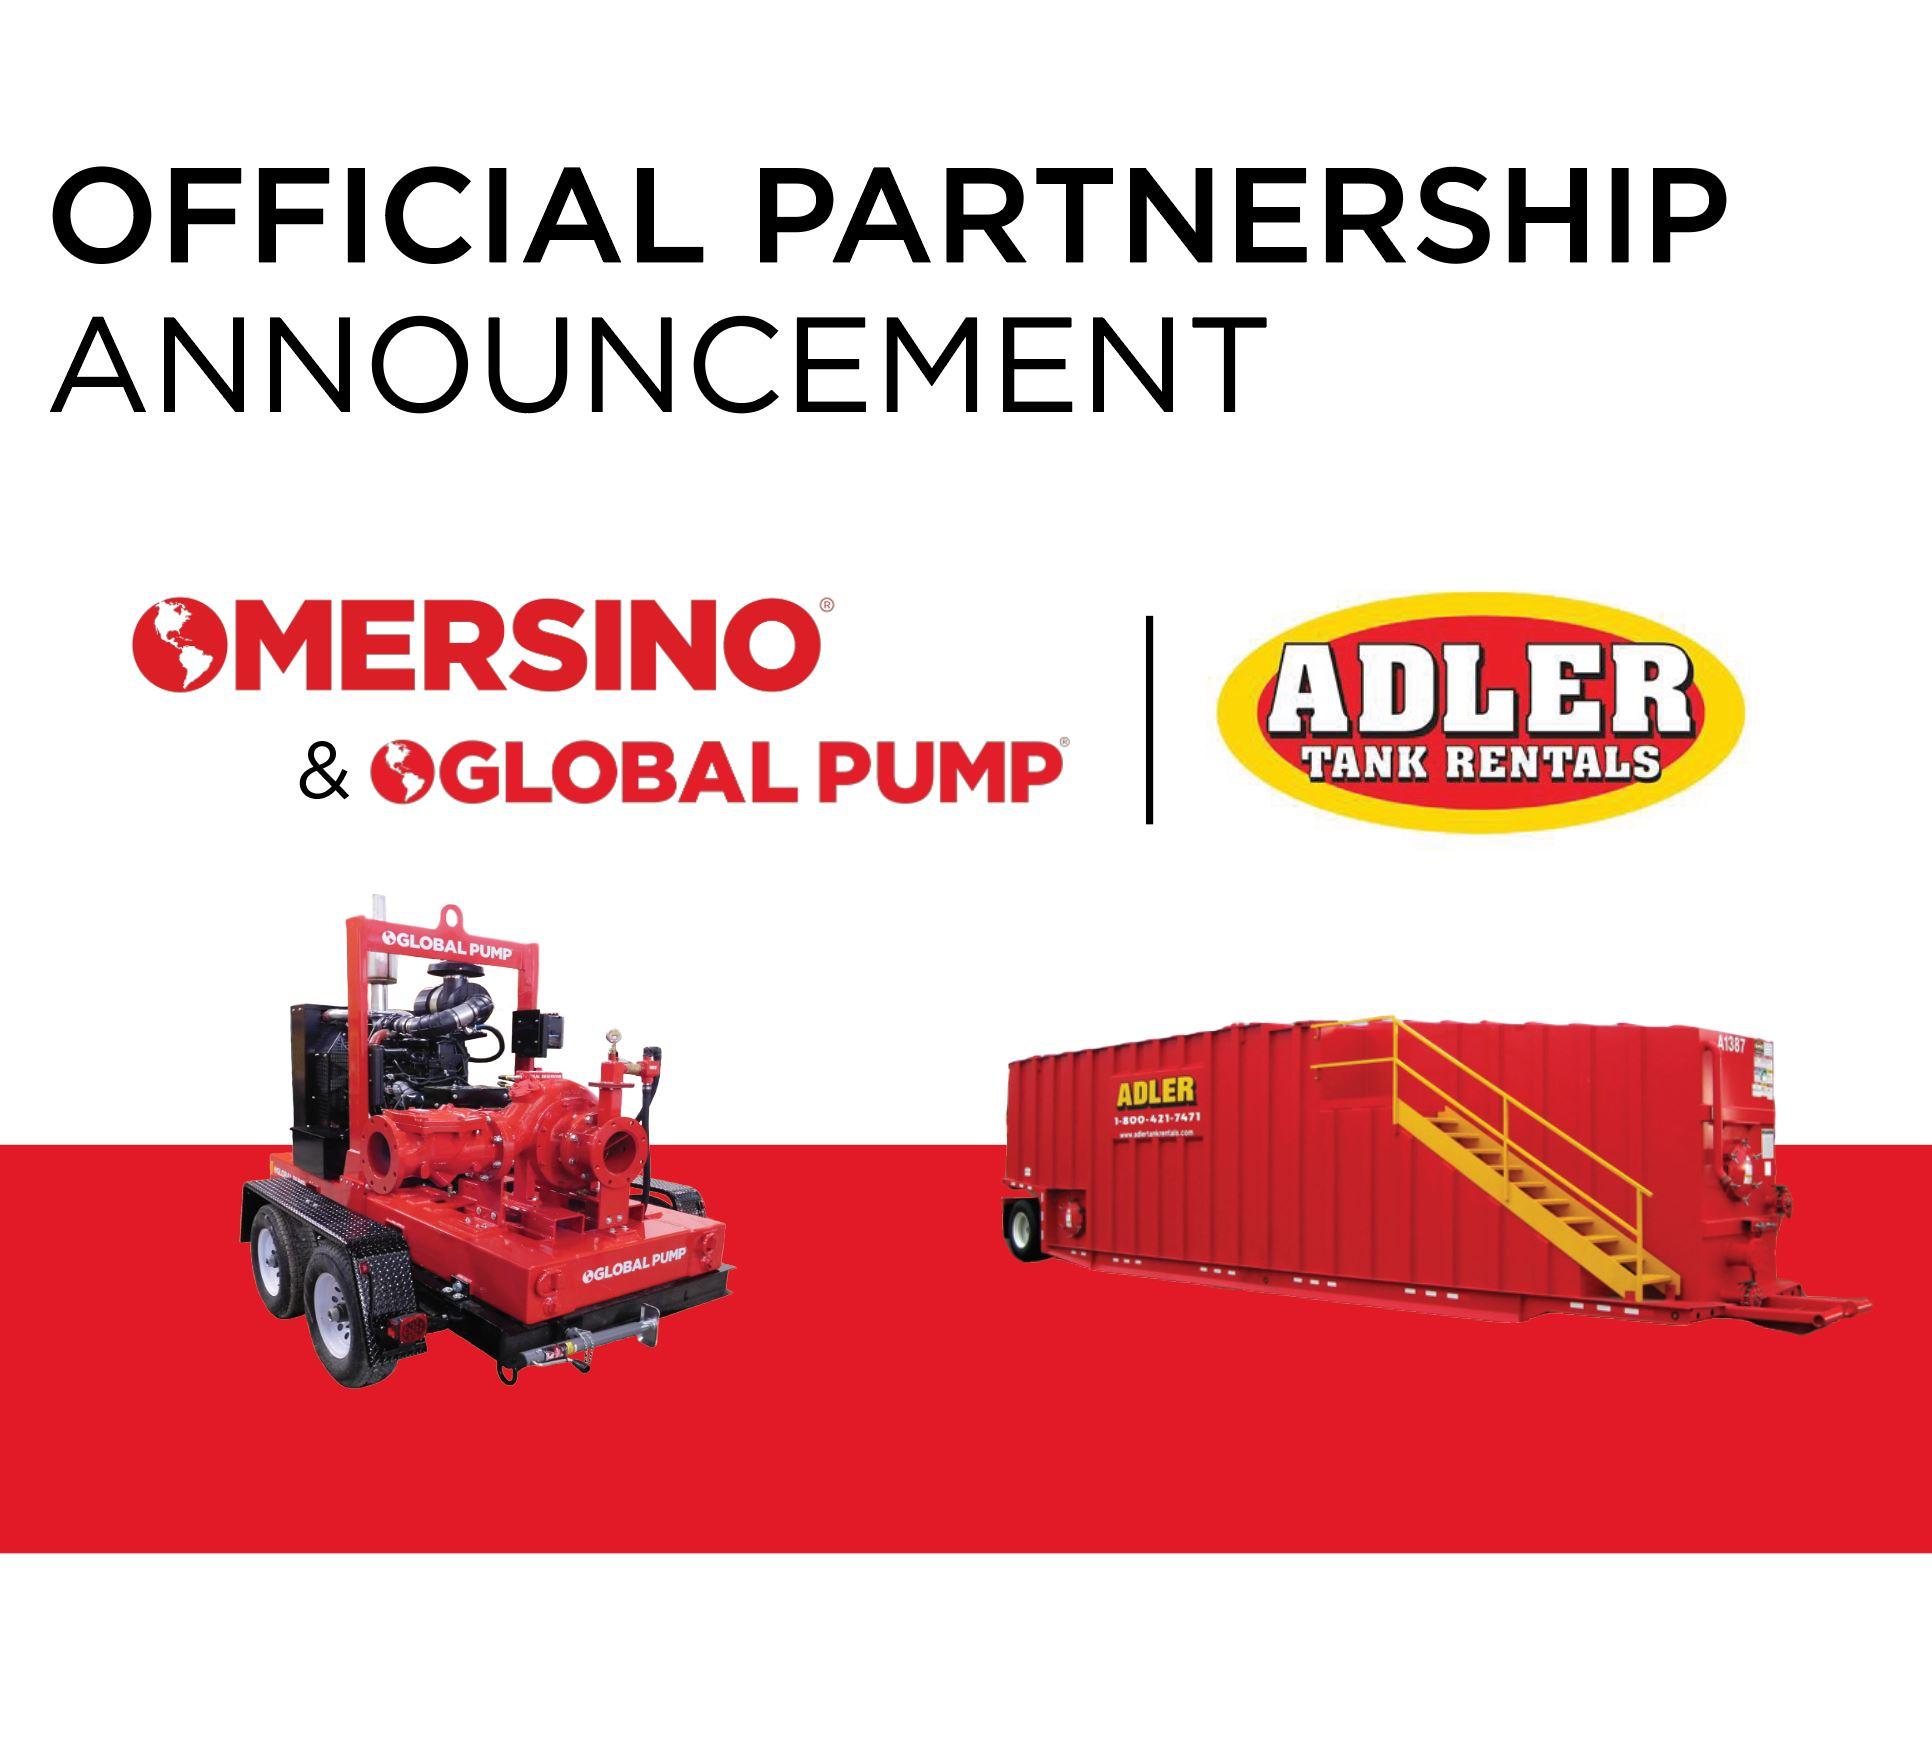 Adler Tank Rental Partnership